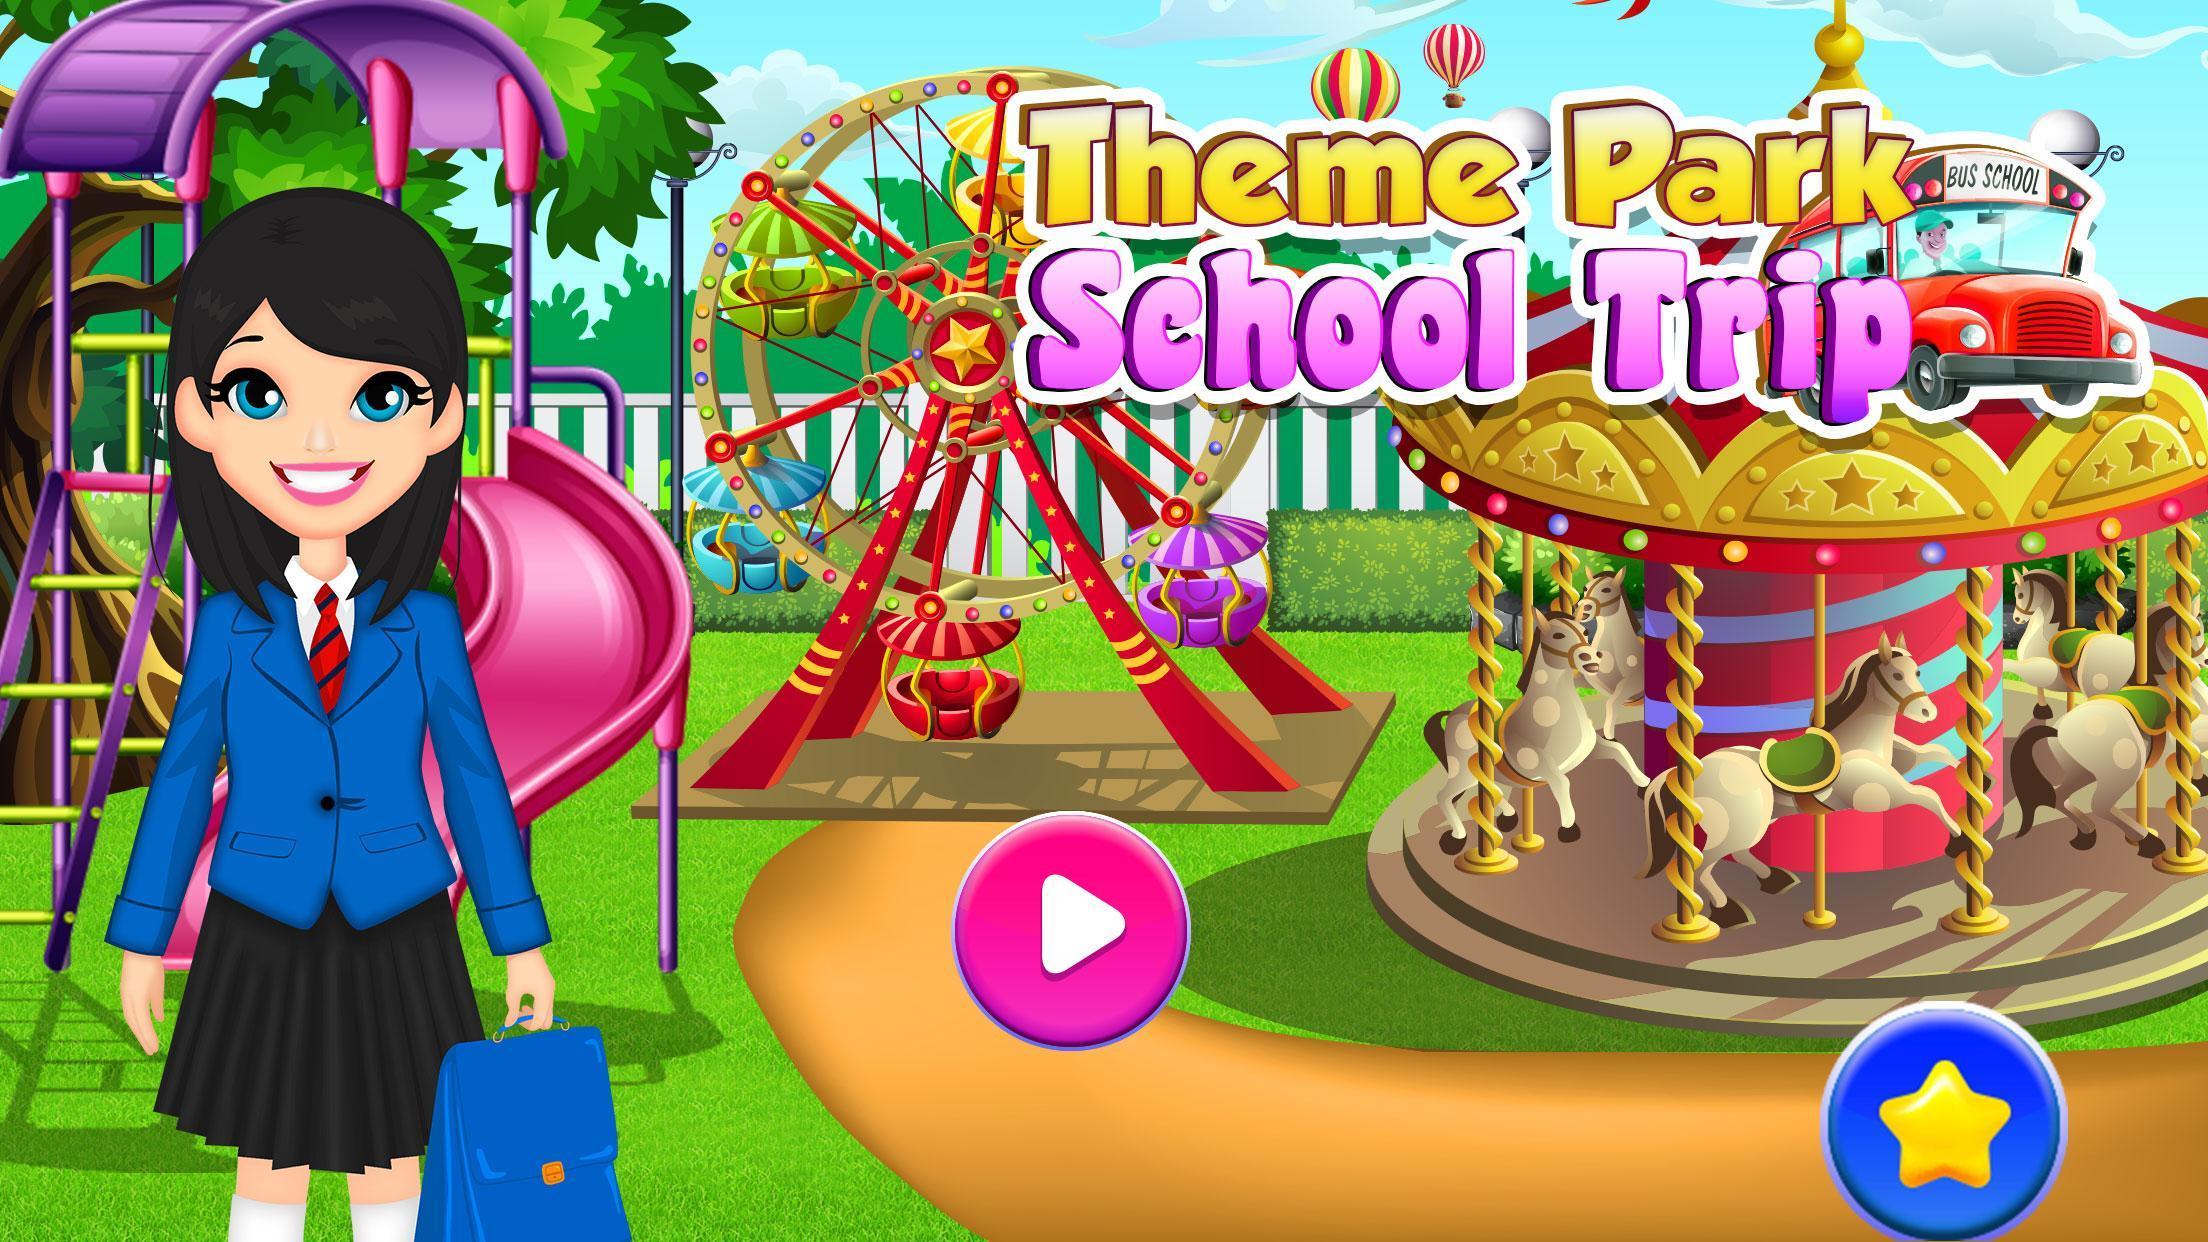 Theme Park School Trip Summer Picnic Adventure 1.0.5 Screenshot 13